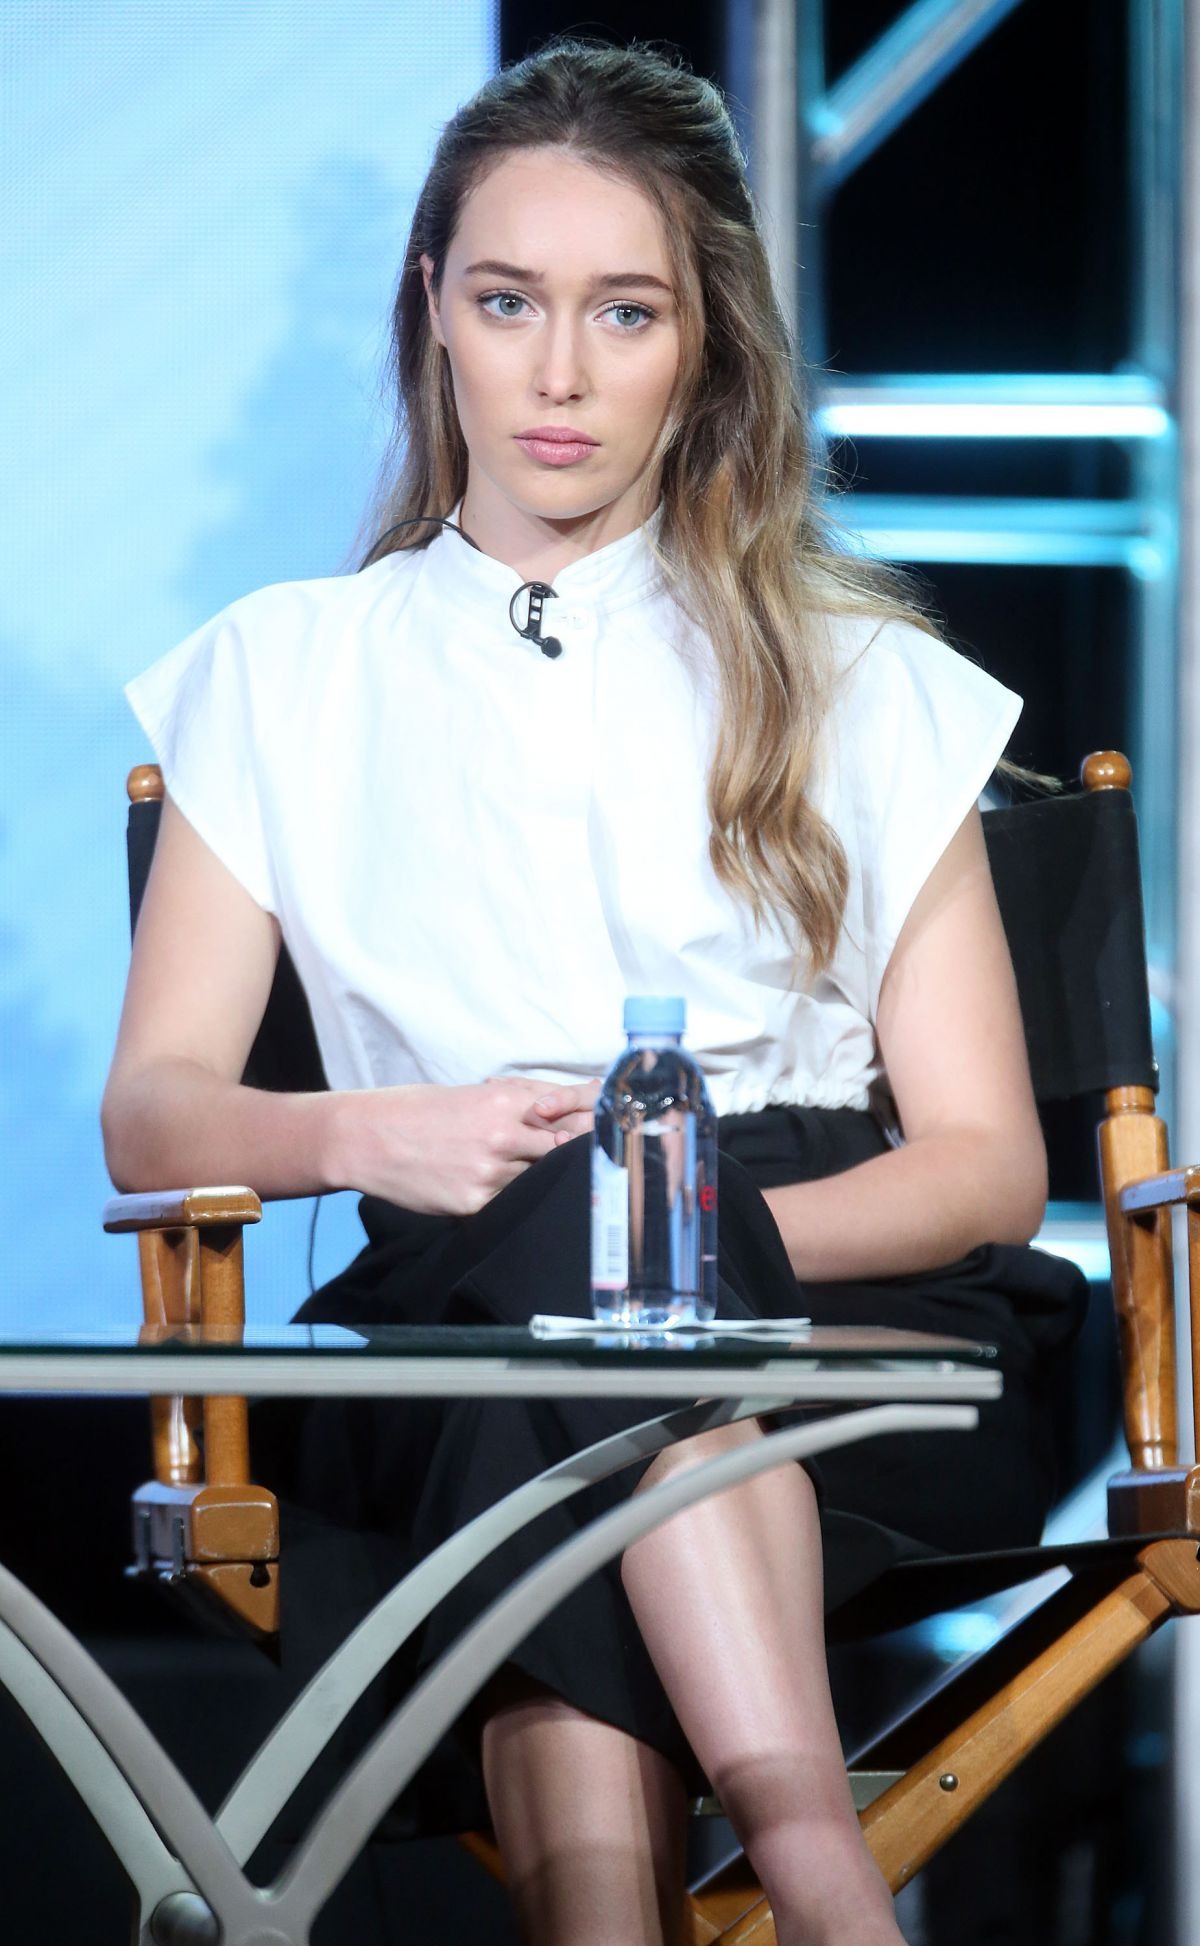 ALYCIA DEBNAM-CAREY at The 100 Panel at 2016 Winter TCA Tour in Pasadena 10/10/2016